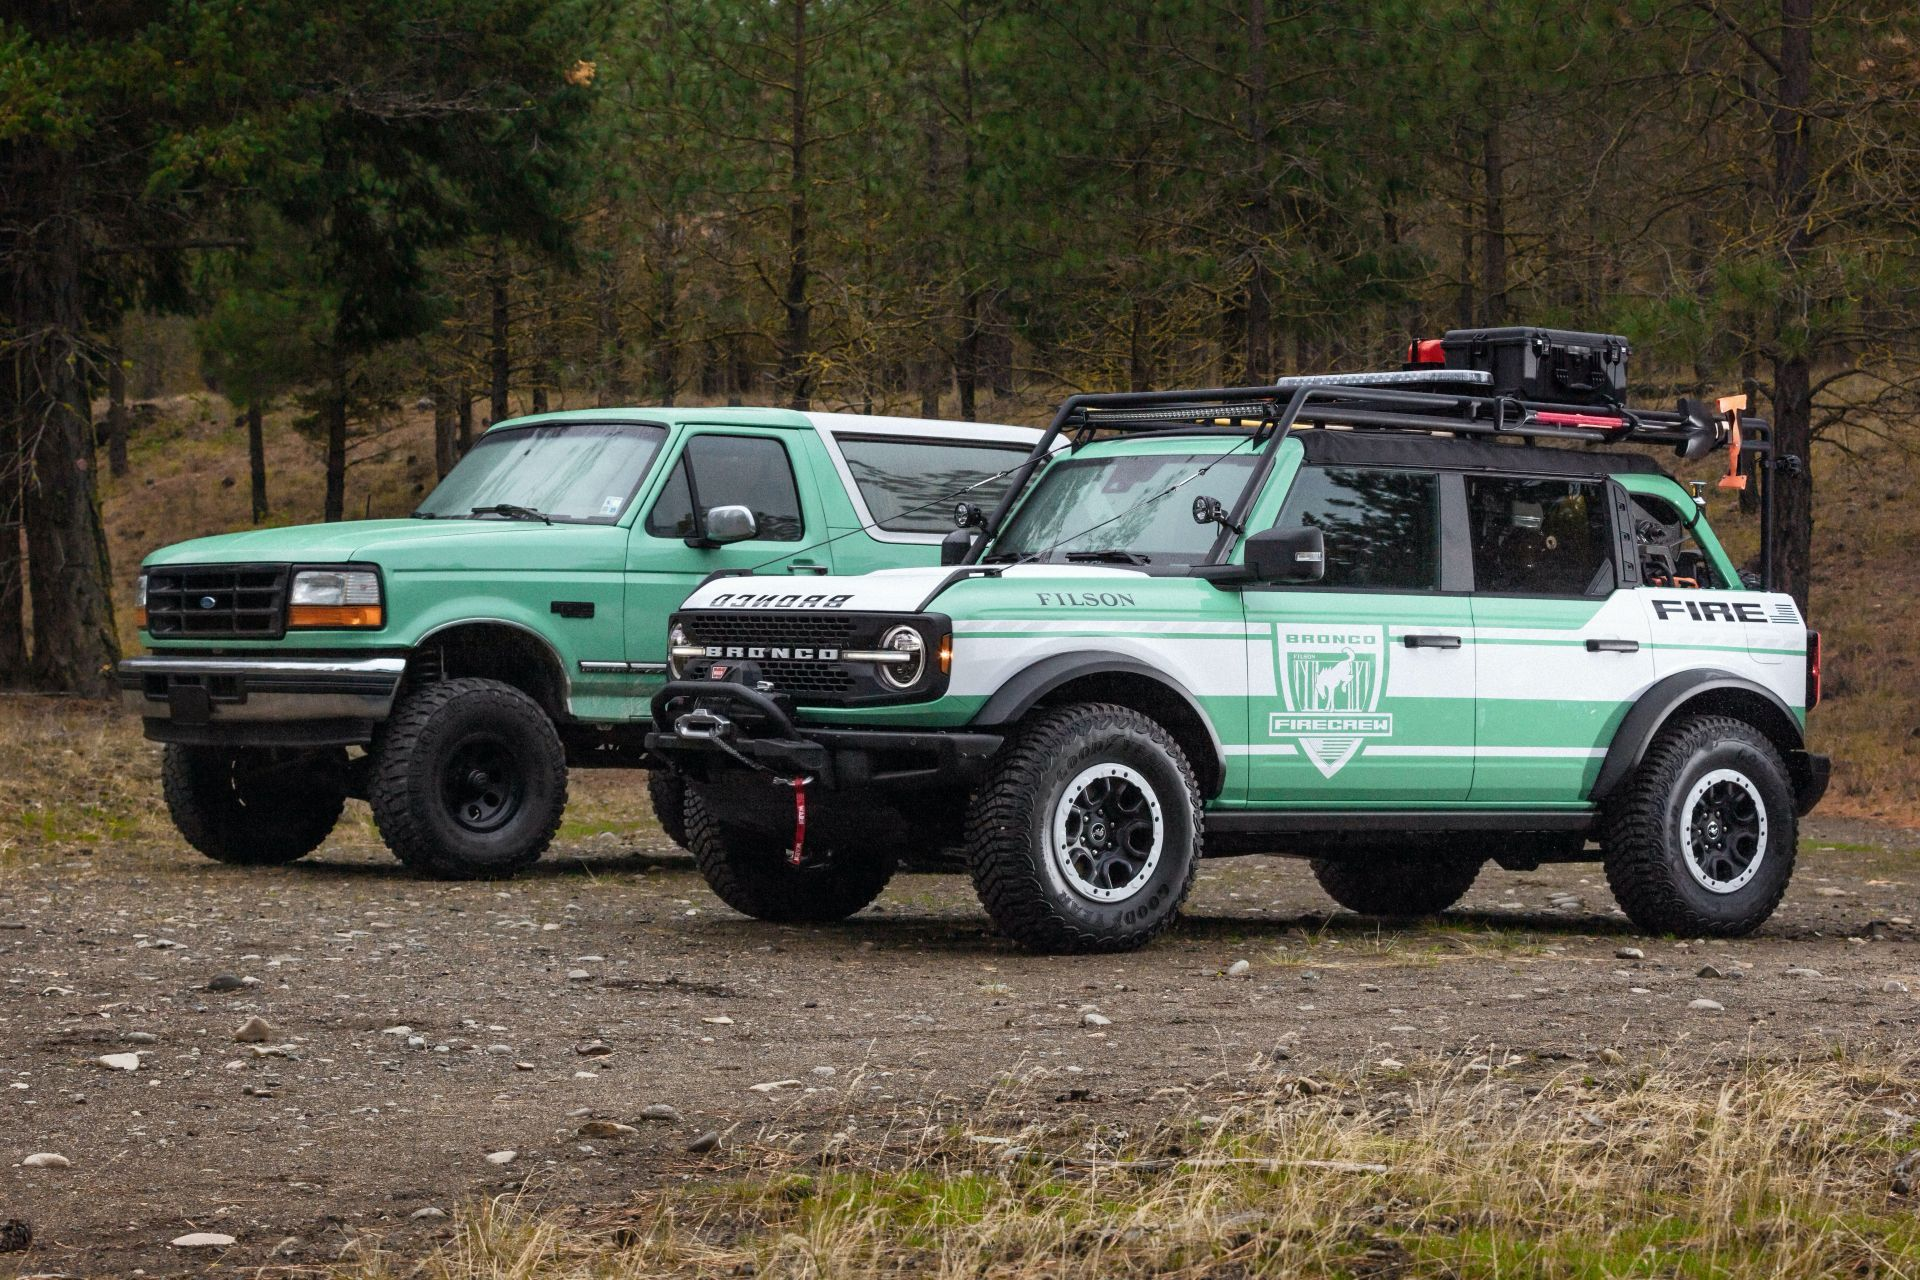 Ford-Bronco-Wildland-Fire-Rig-Concept-3